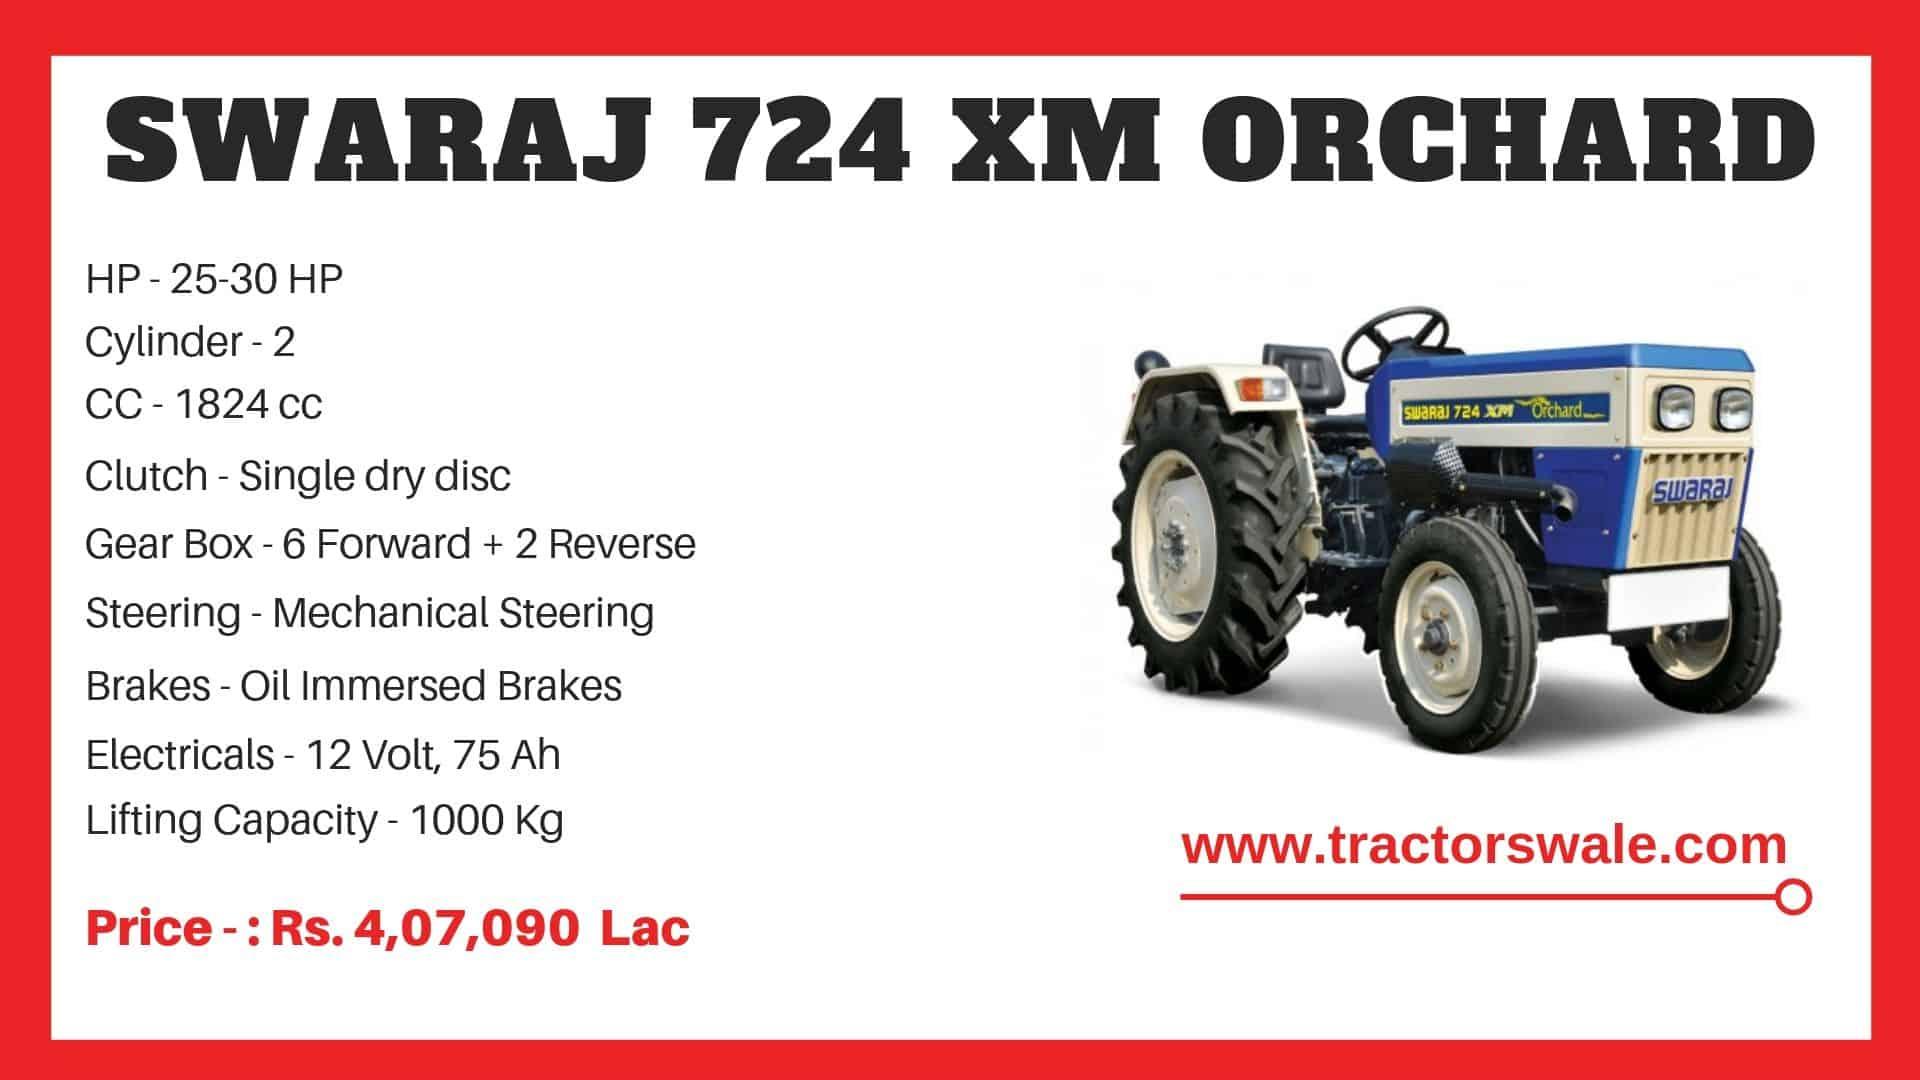 Specification of Swaraj 724 XM ORCHARD